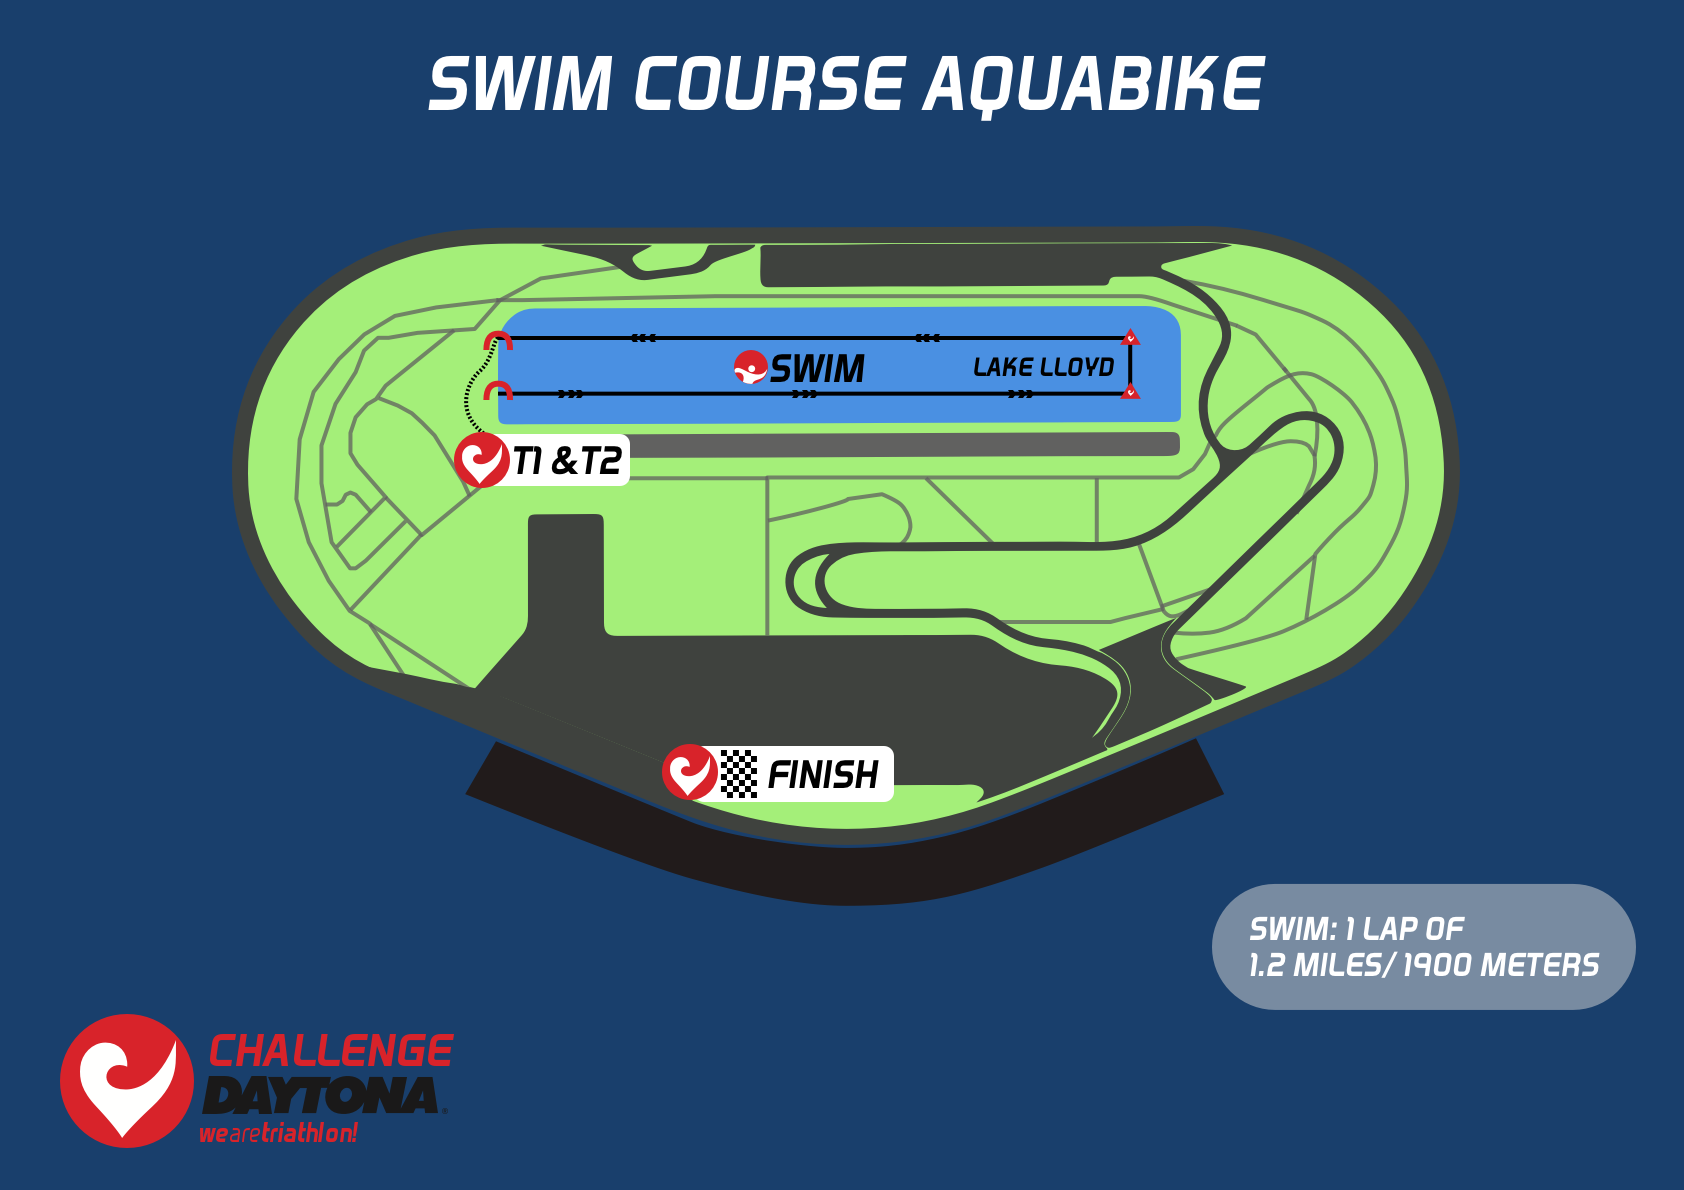 Aquabike Middle Distance